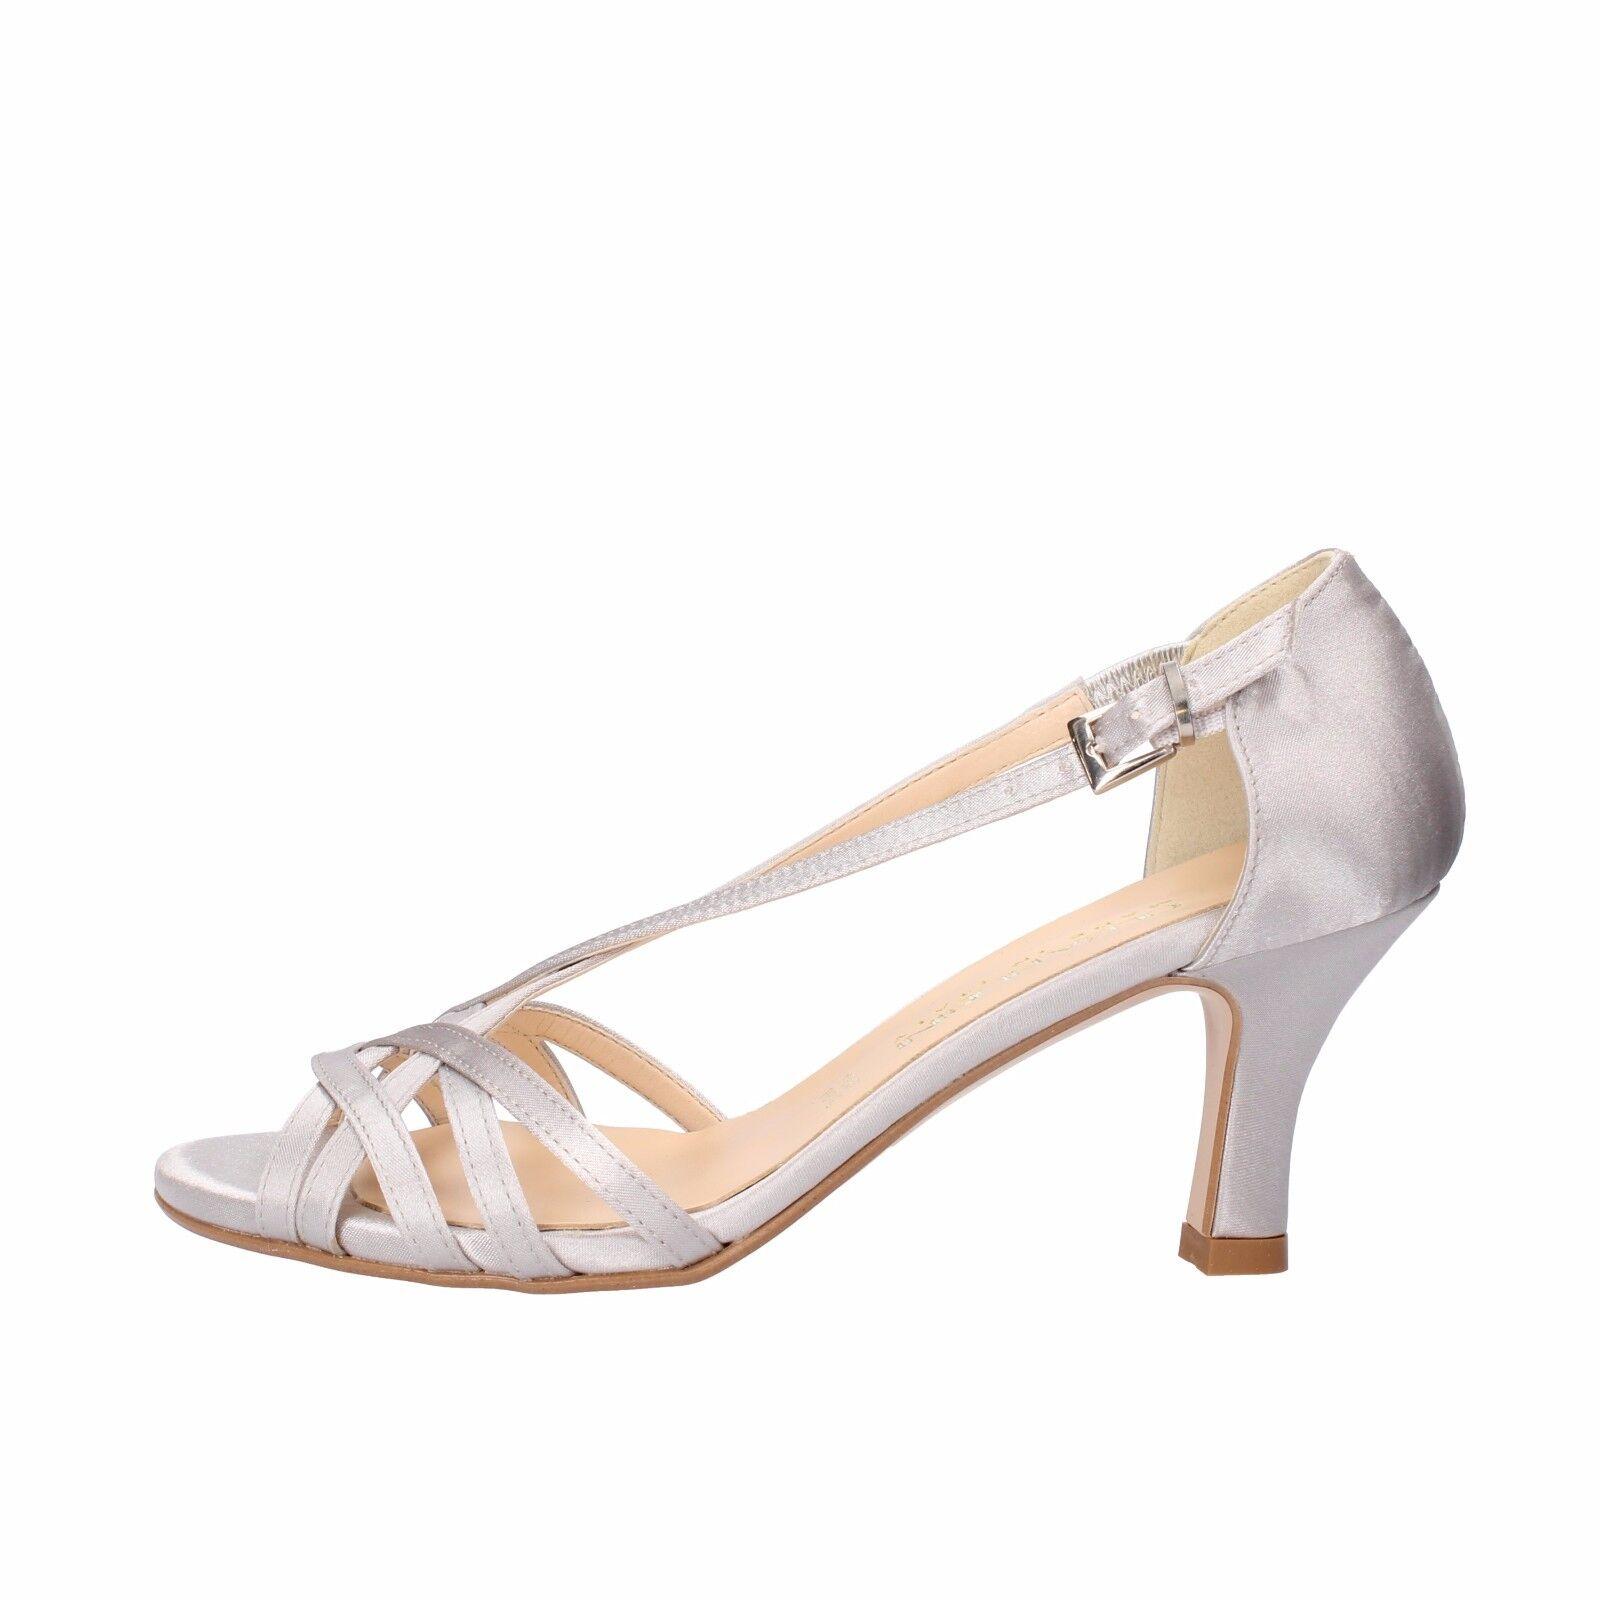 scarpe donna OLGA RUBINI 38 EU sandali argento raso AF133-D3